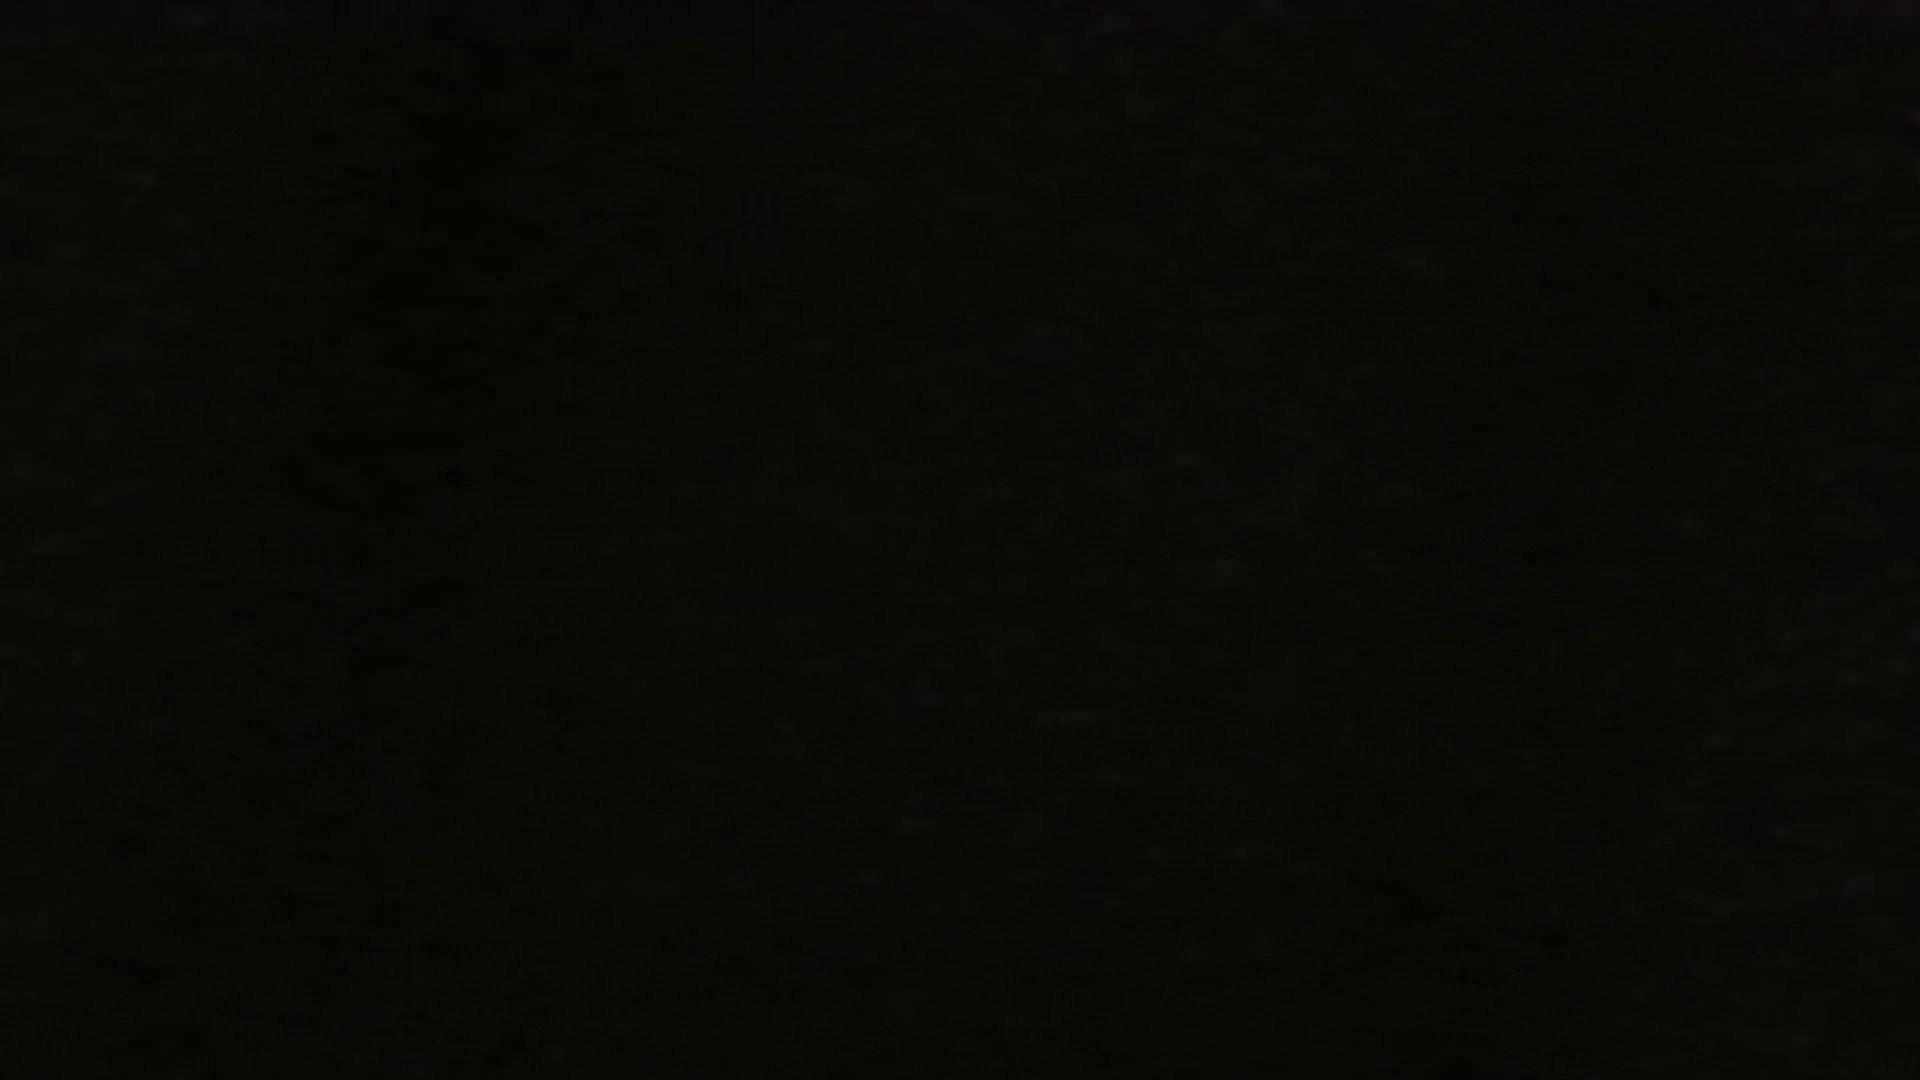 SPYさん初投稿!マンション覗き!5000K!ハイビジョン撮影VOL.05(元サッカー部員社会人) スポーツマン  38pic 7